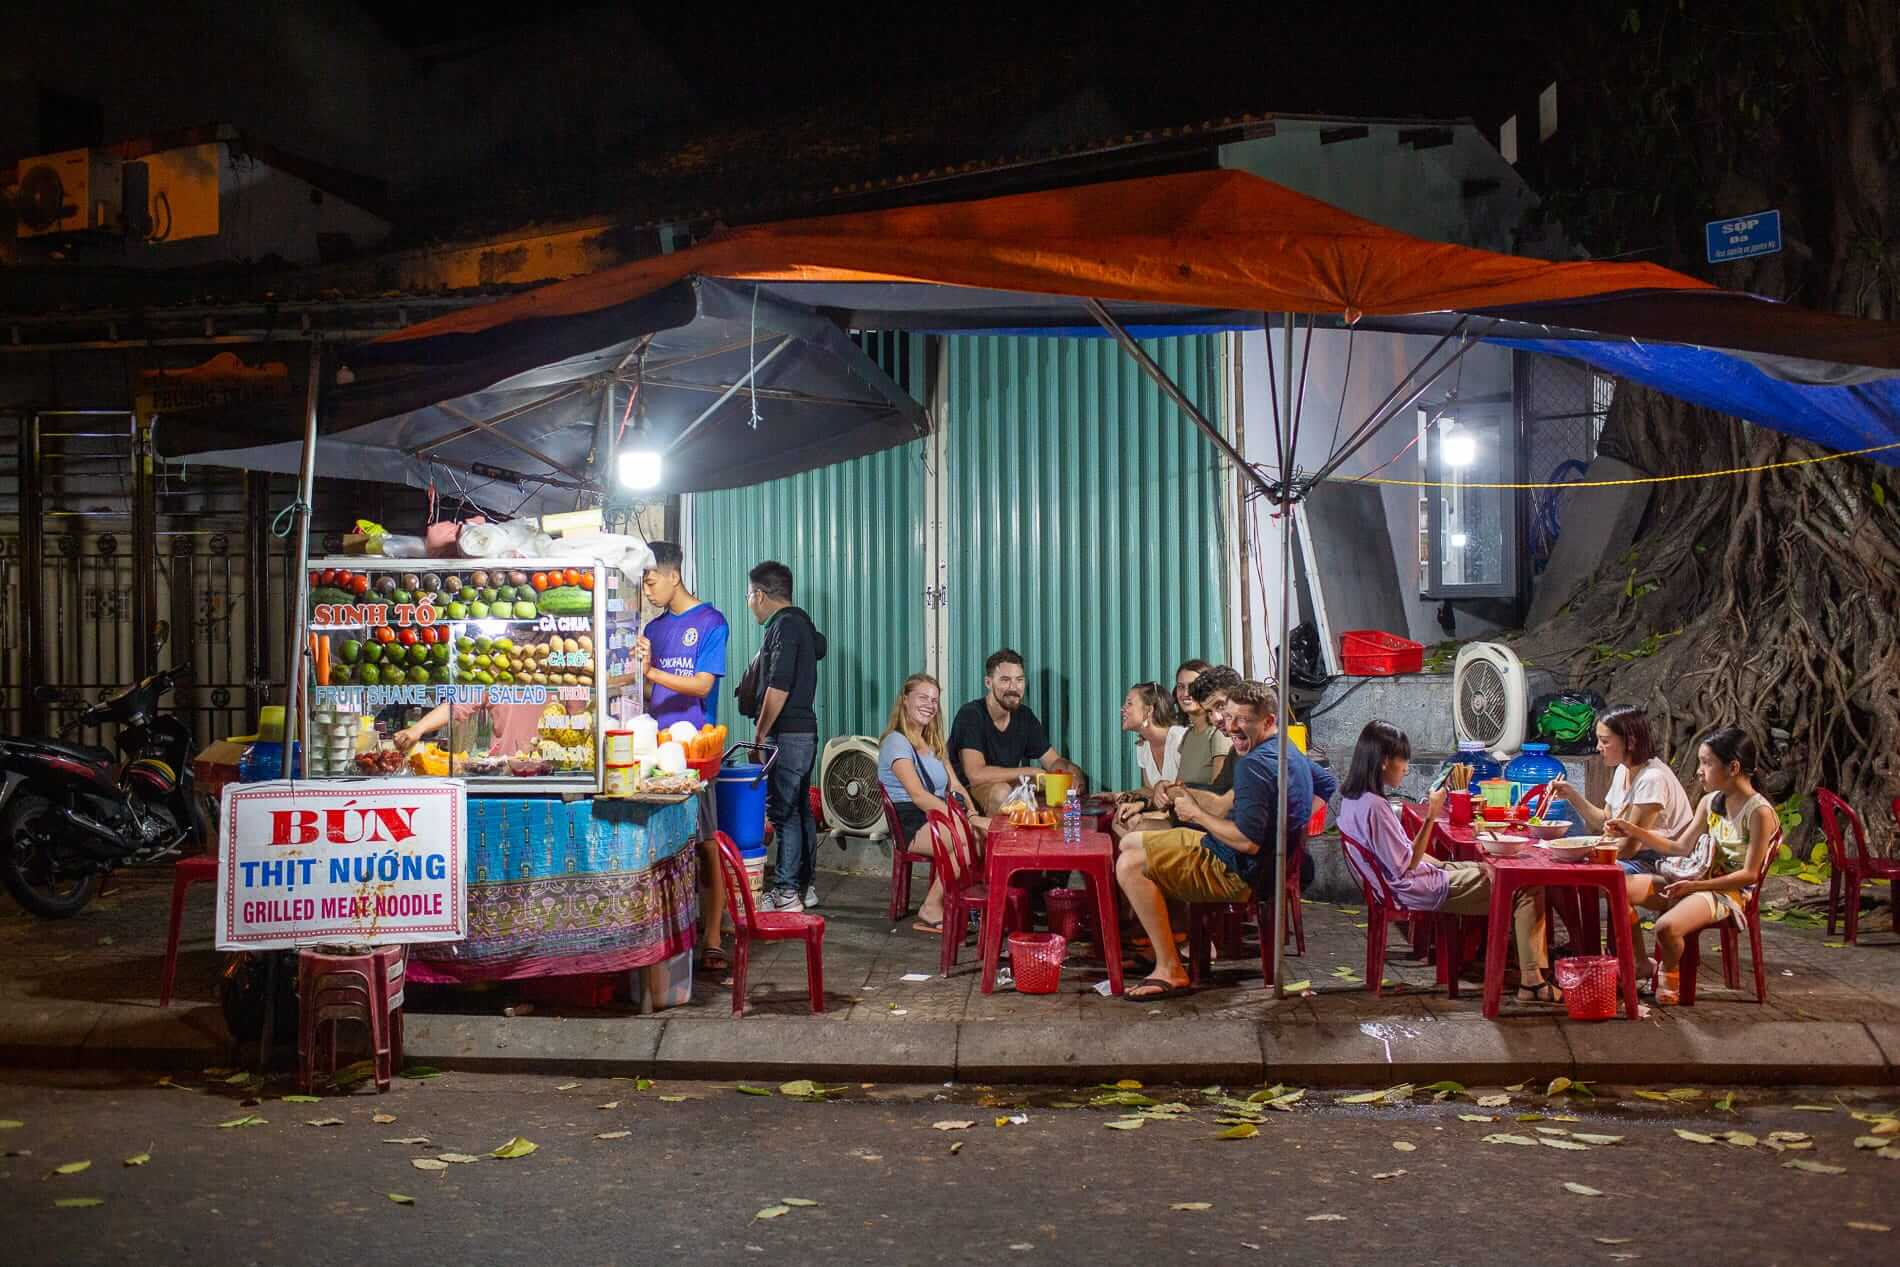 travelers in Hoi An enjoying the food tour at night